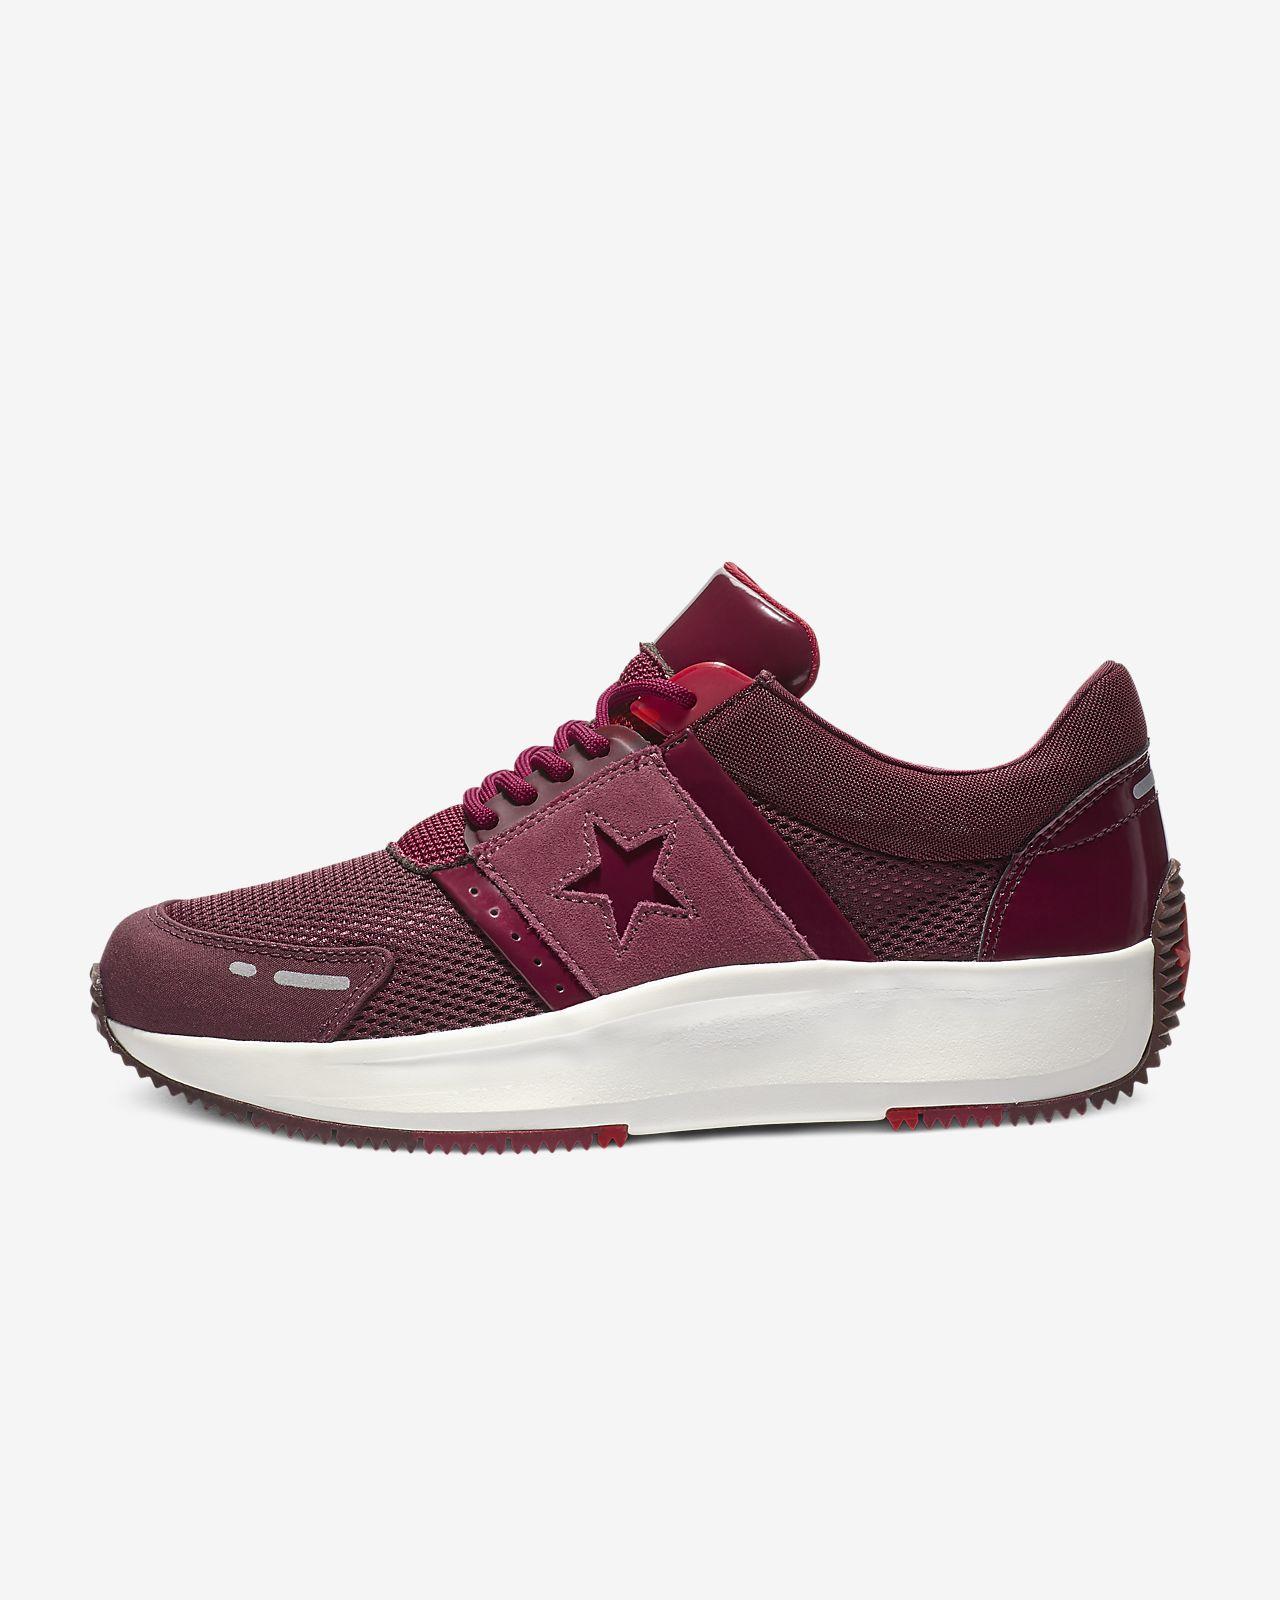 Covnverse Run Star The Rundown Low Top Unisex Shoe